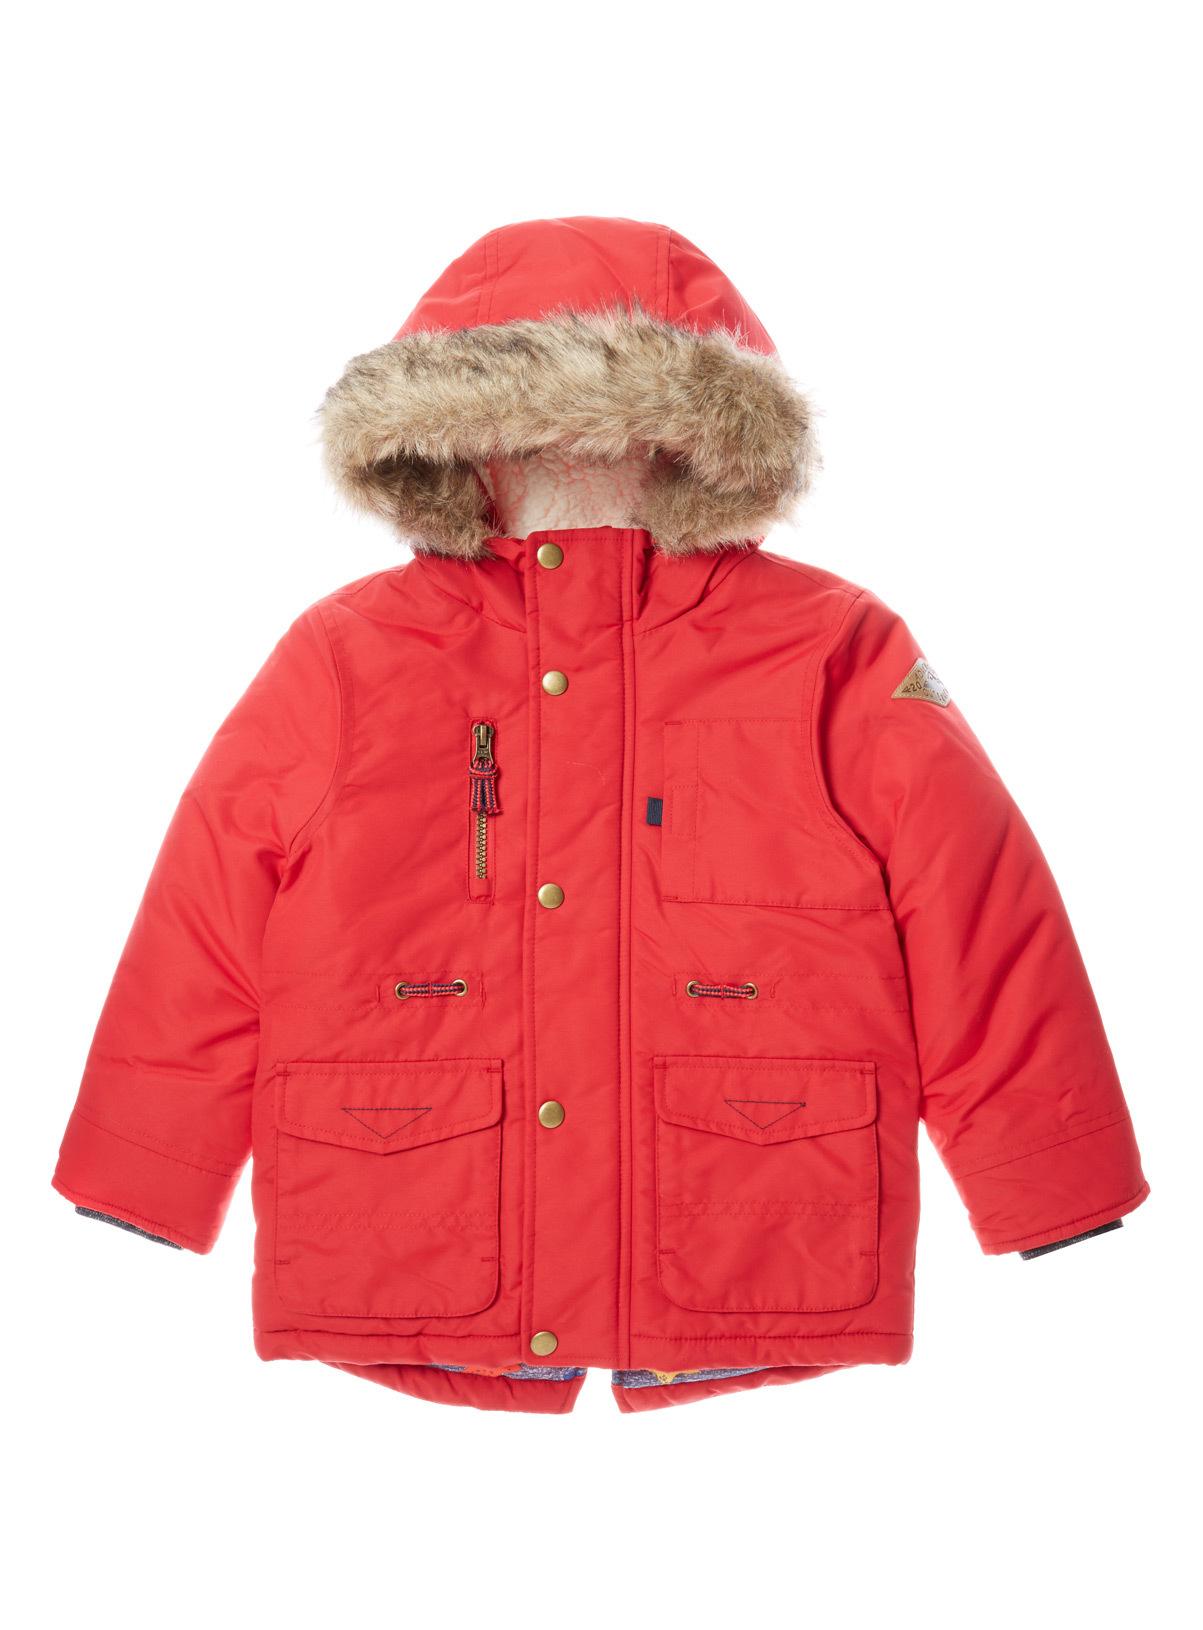 Kids Coats | Boys Coats & Jackets | Tu clothing